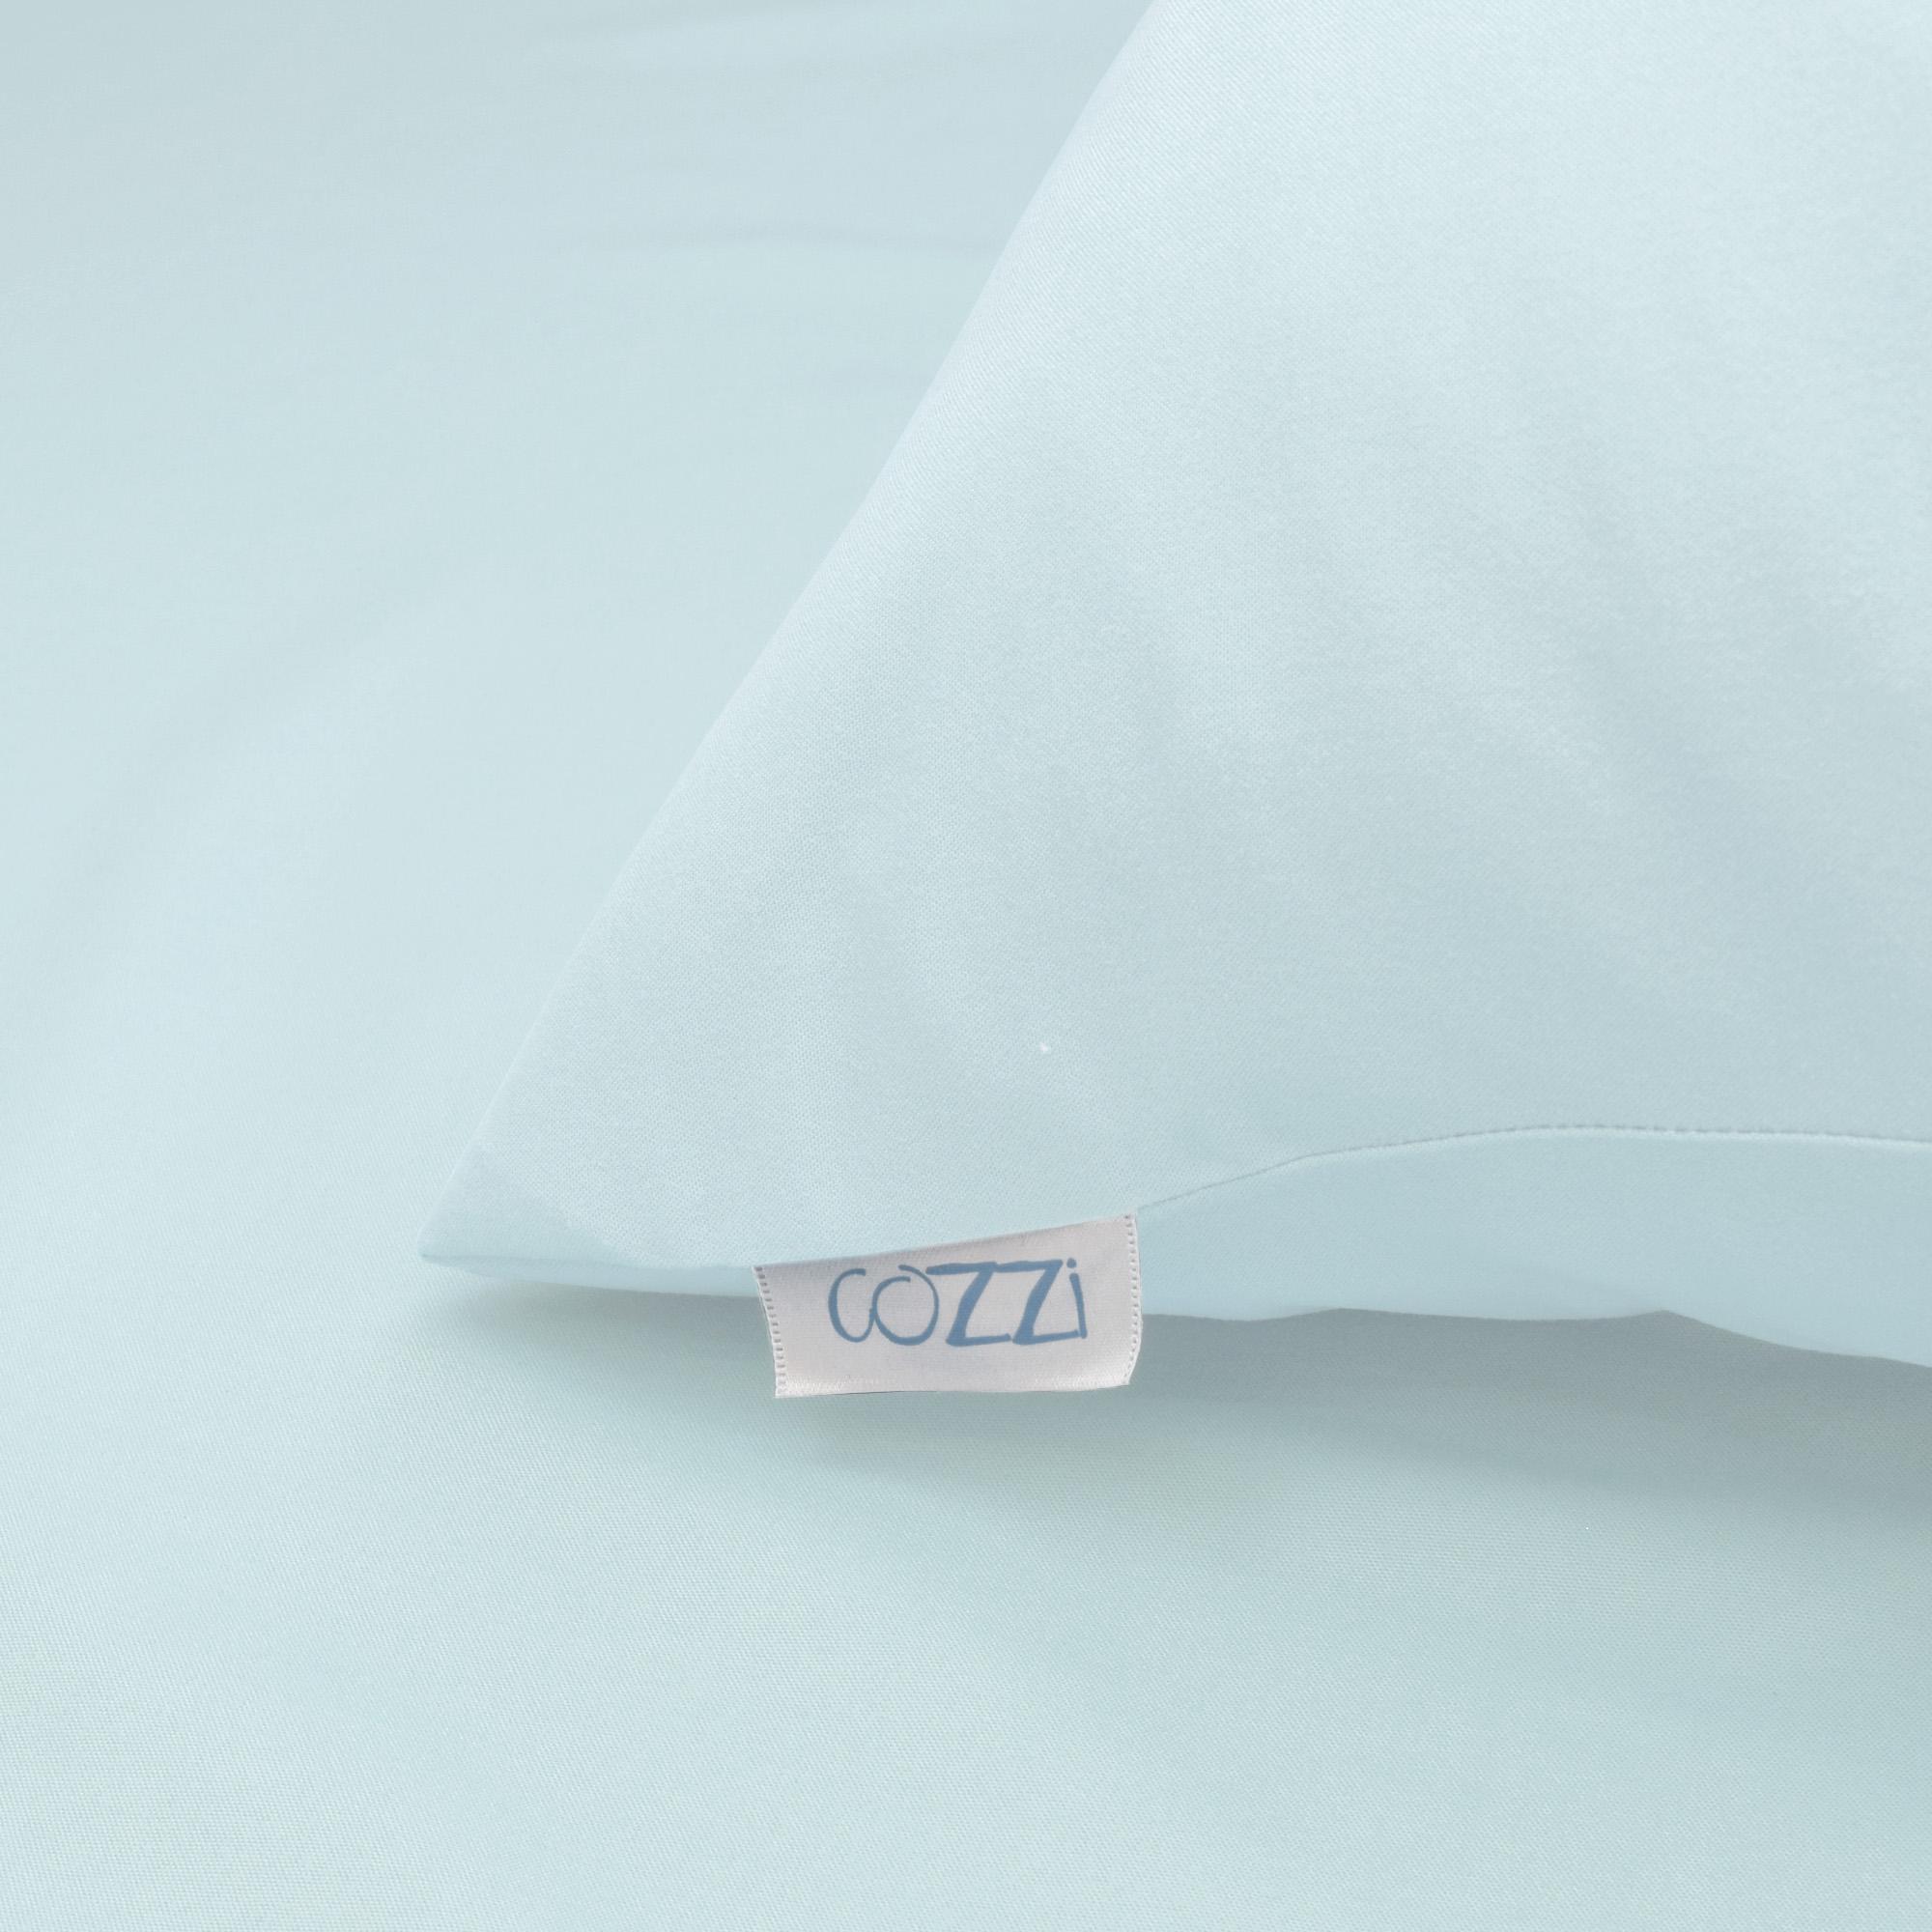 Cozzi Magic Colour Microfiber Quilt Cover + Pillow case ( Cadar Bedsheet not included )